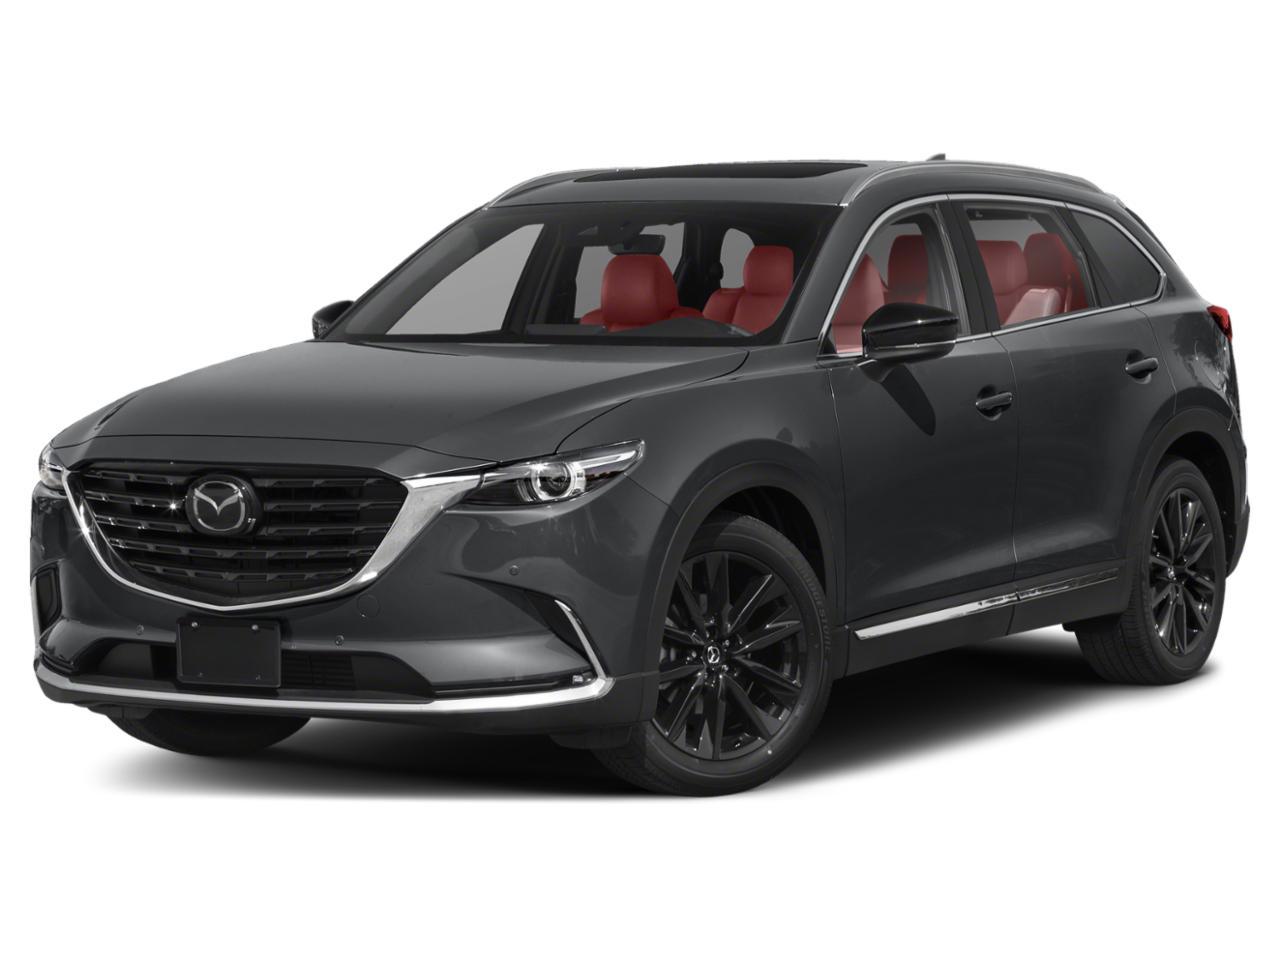 2021 Mazda CX-9 Vehicle Photo in Plainfield, IL 60586